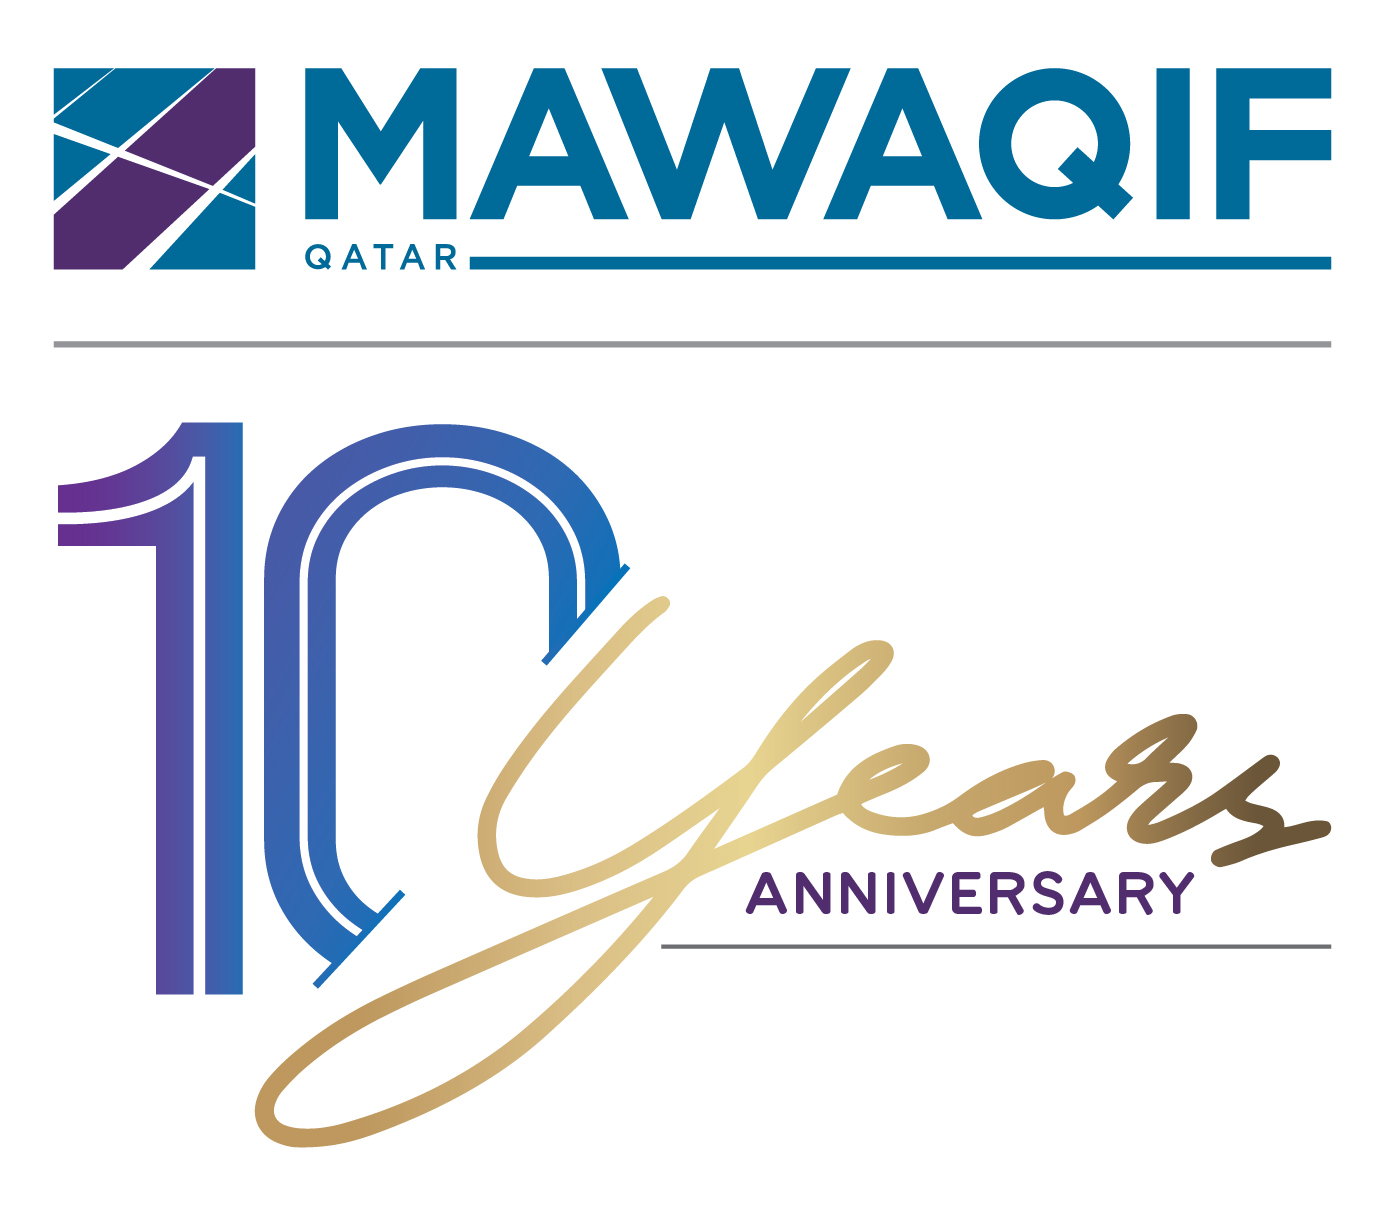 Mawaqif Qatar, by QDVP, is celebrating its 10 years anniversary